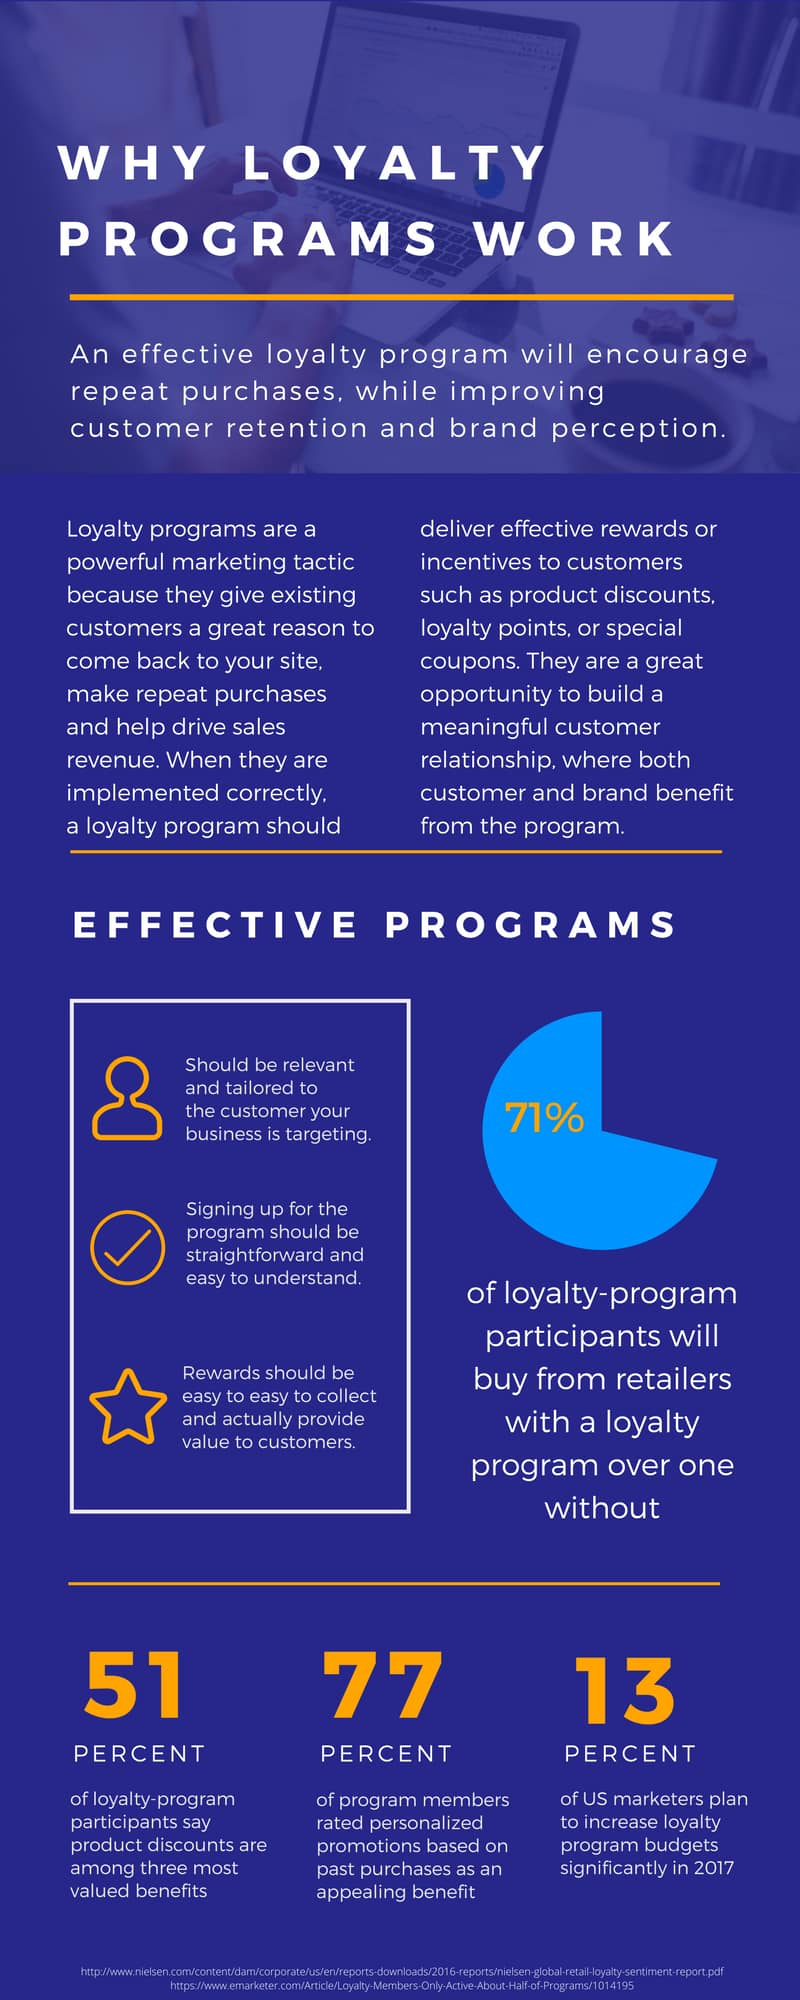 Why loyalty programs work